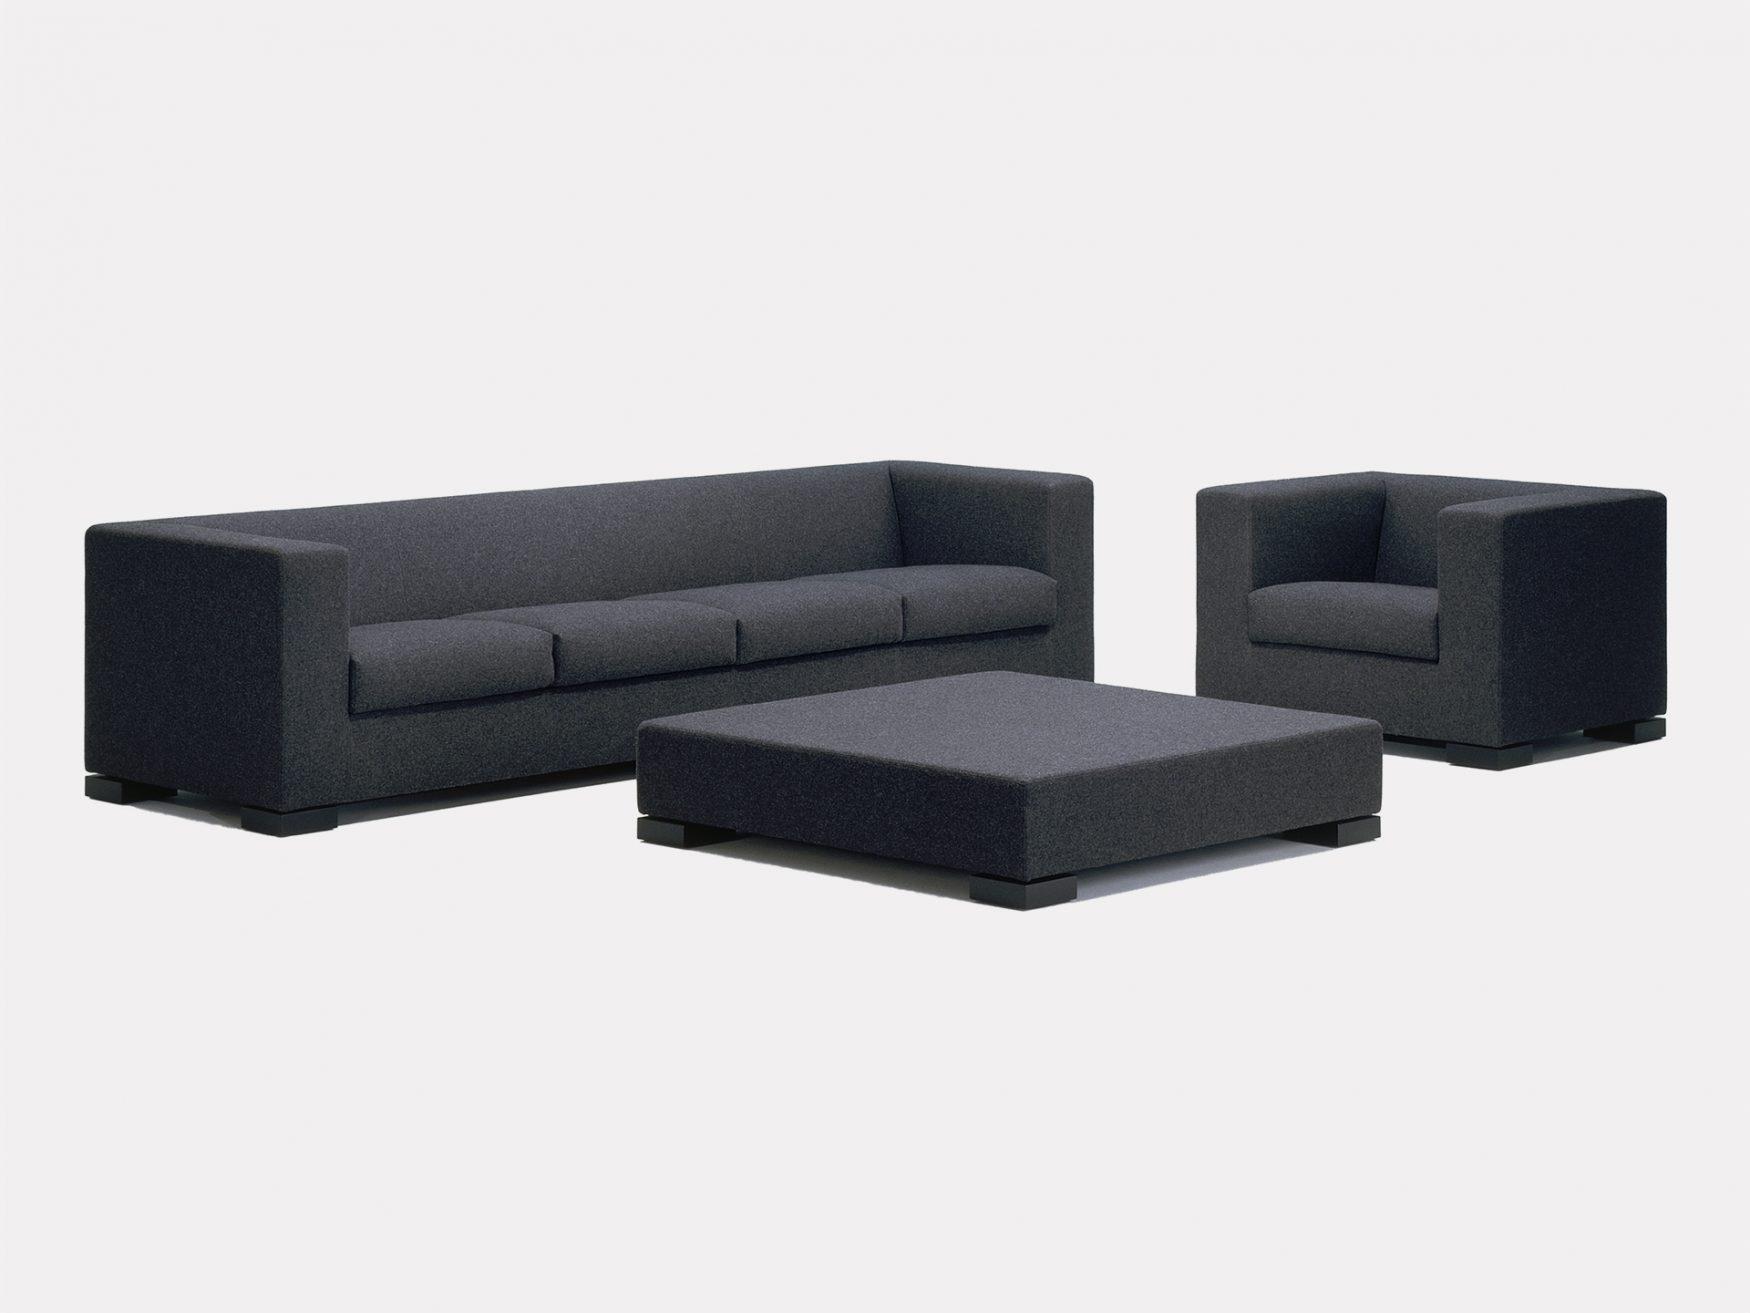 Wohnlandschaft oval  Camin sofa - Alveena Casa